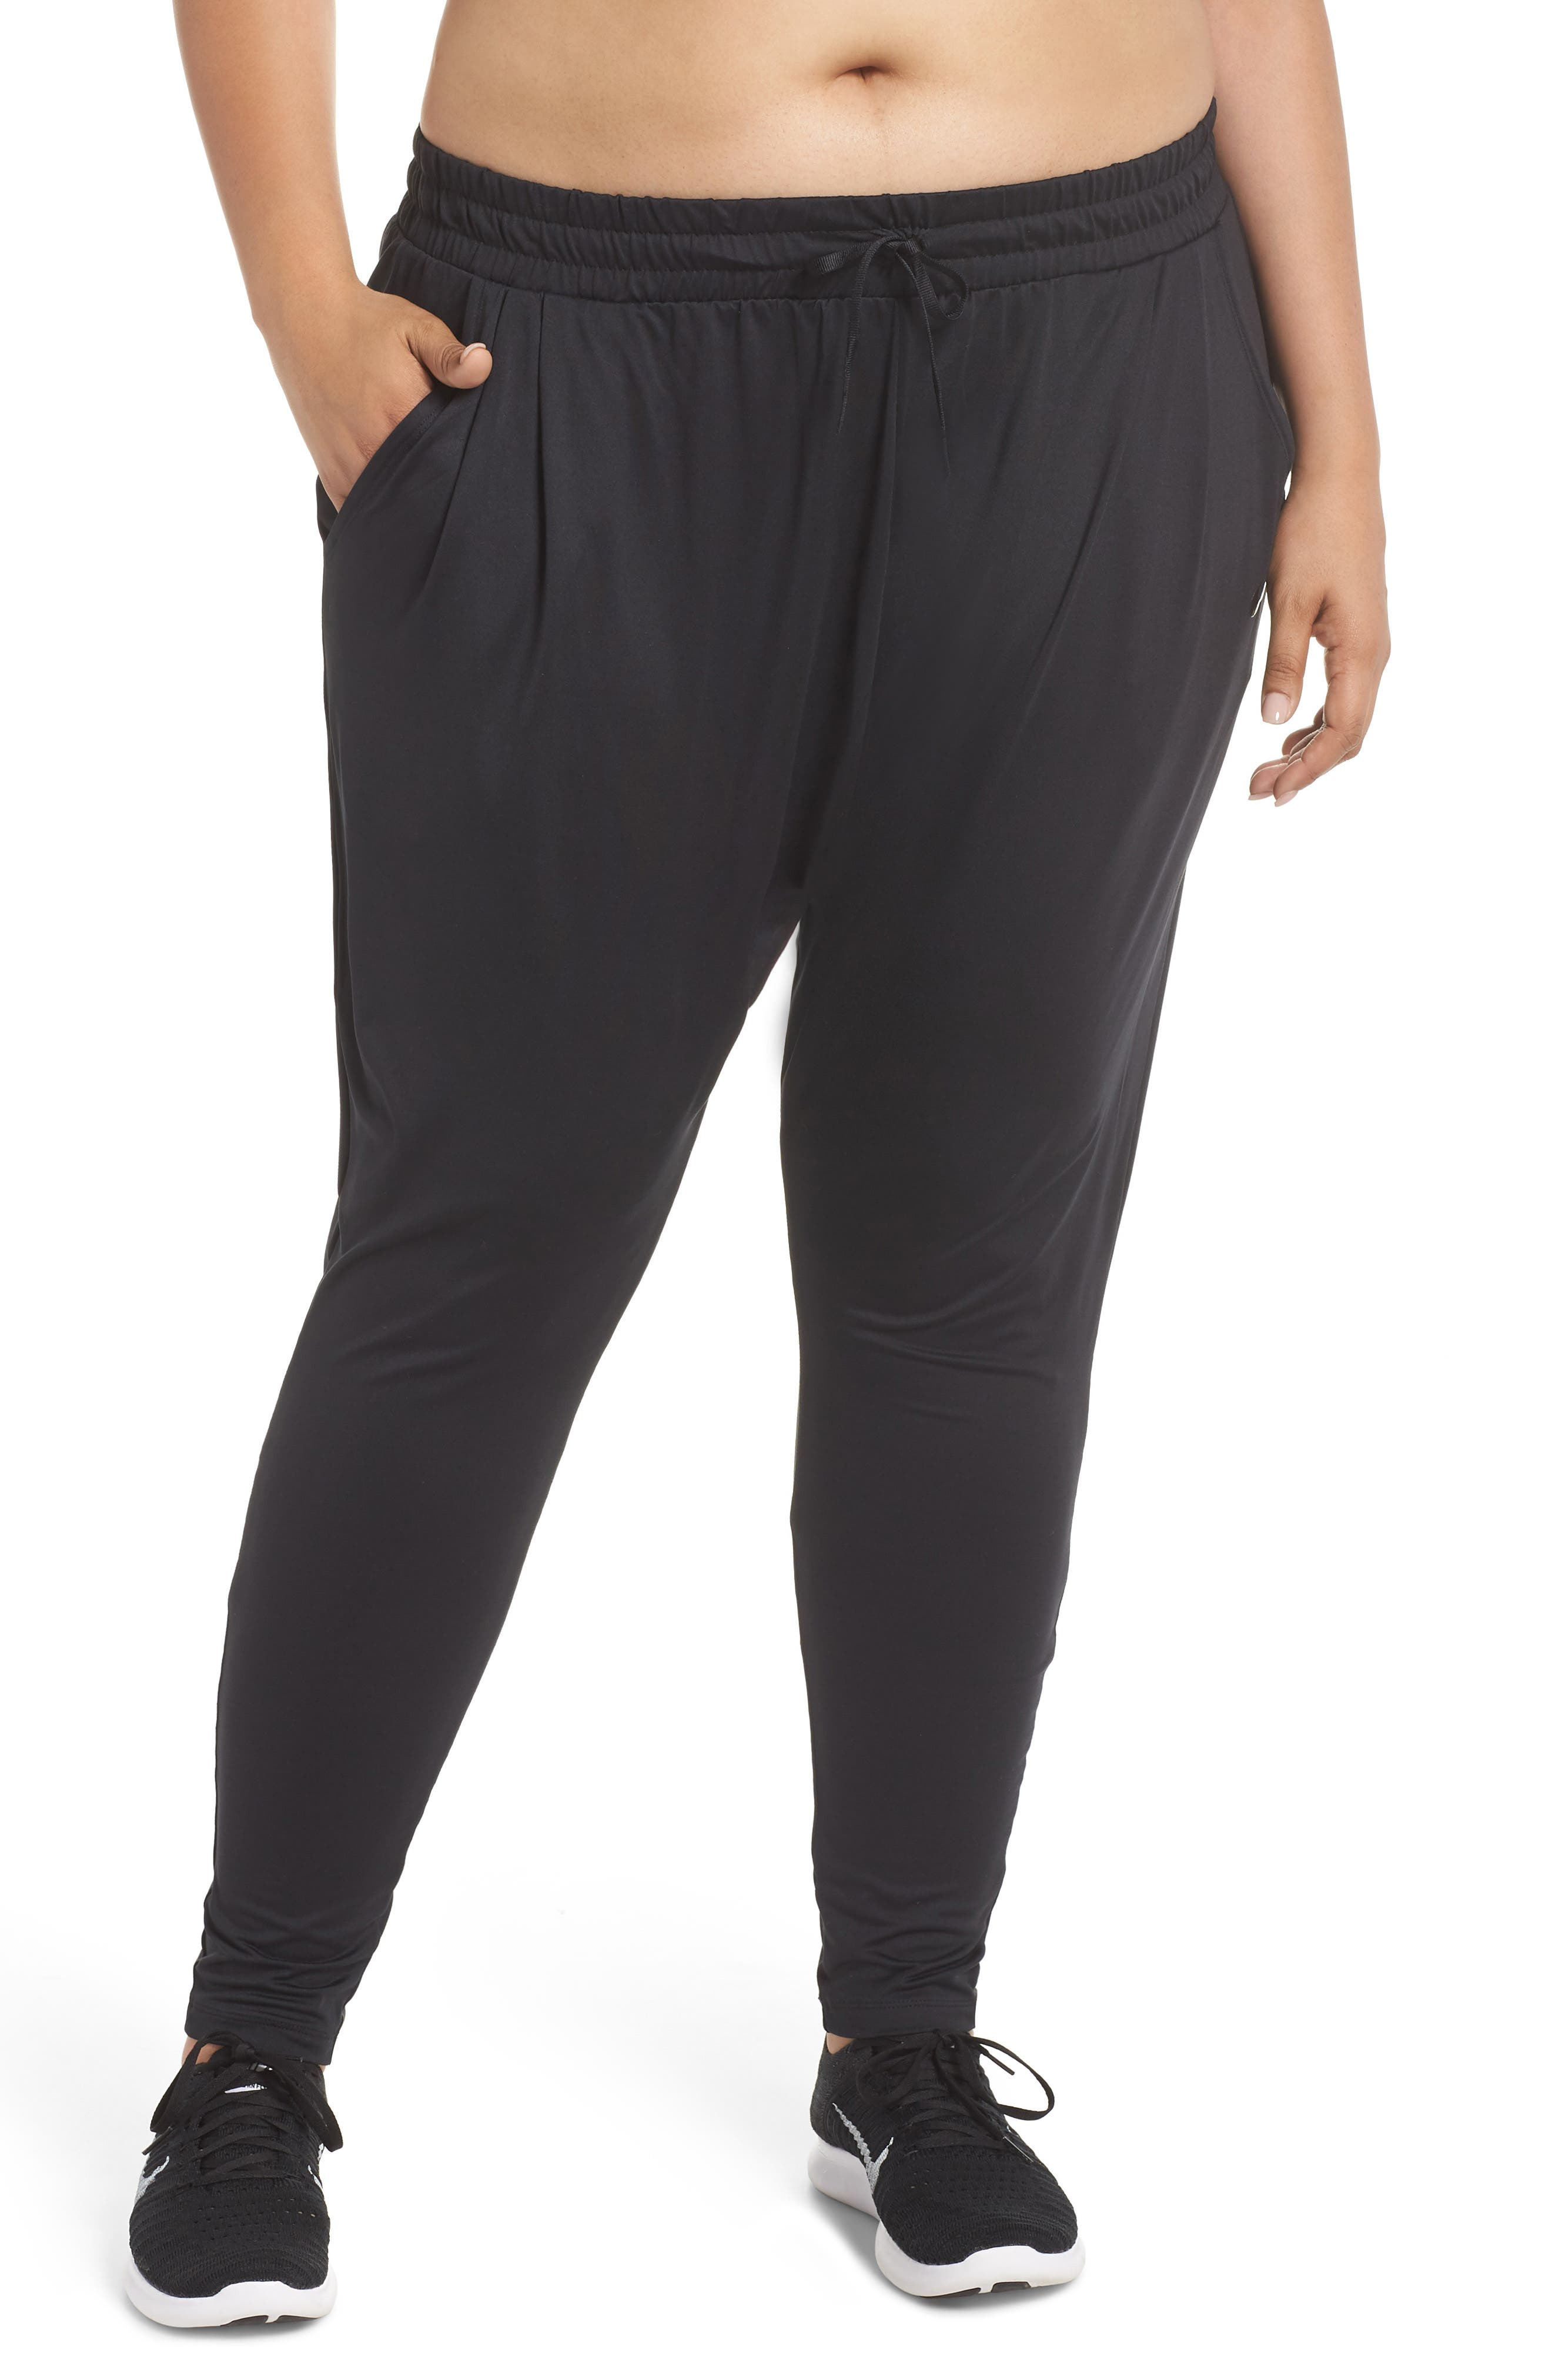 Dry Lux Flow Training Pants,                         Main,                         color, Black/ Clear